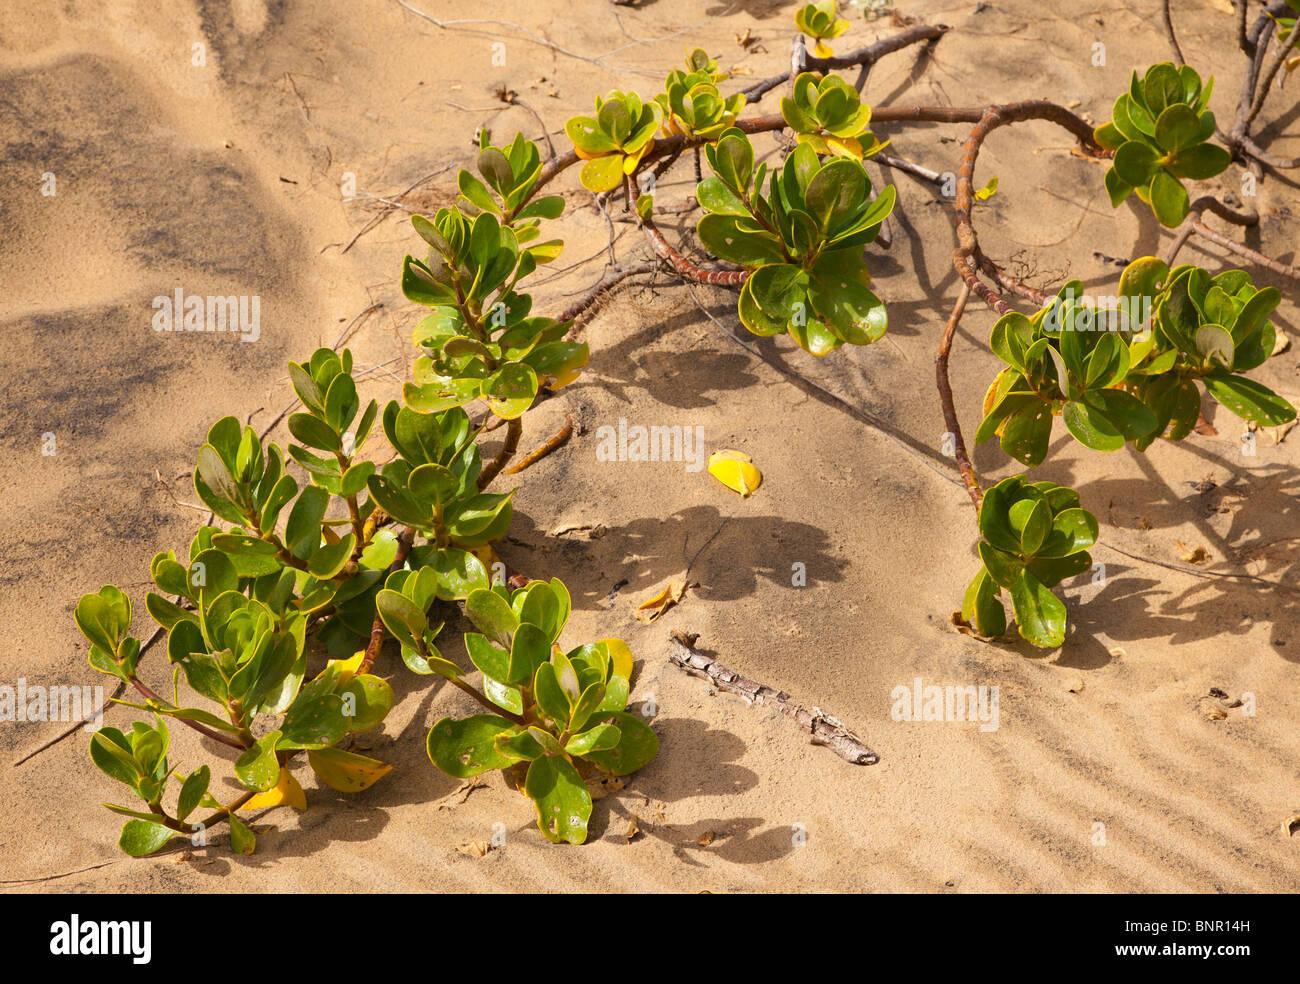 dune vegitation - Stock Image